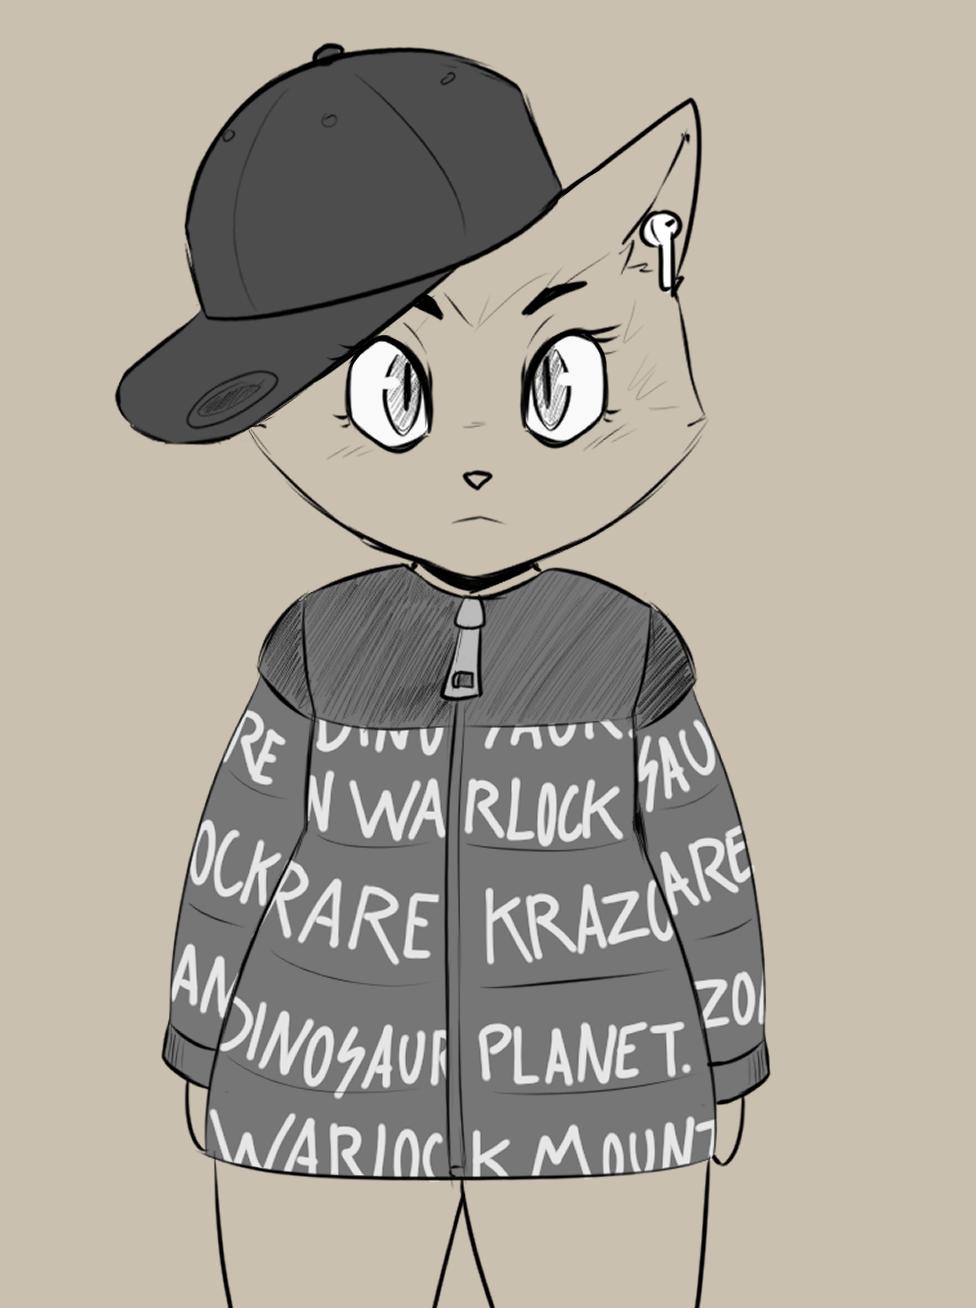 Dinosaur Planet sketches